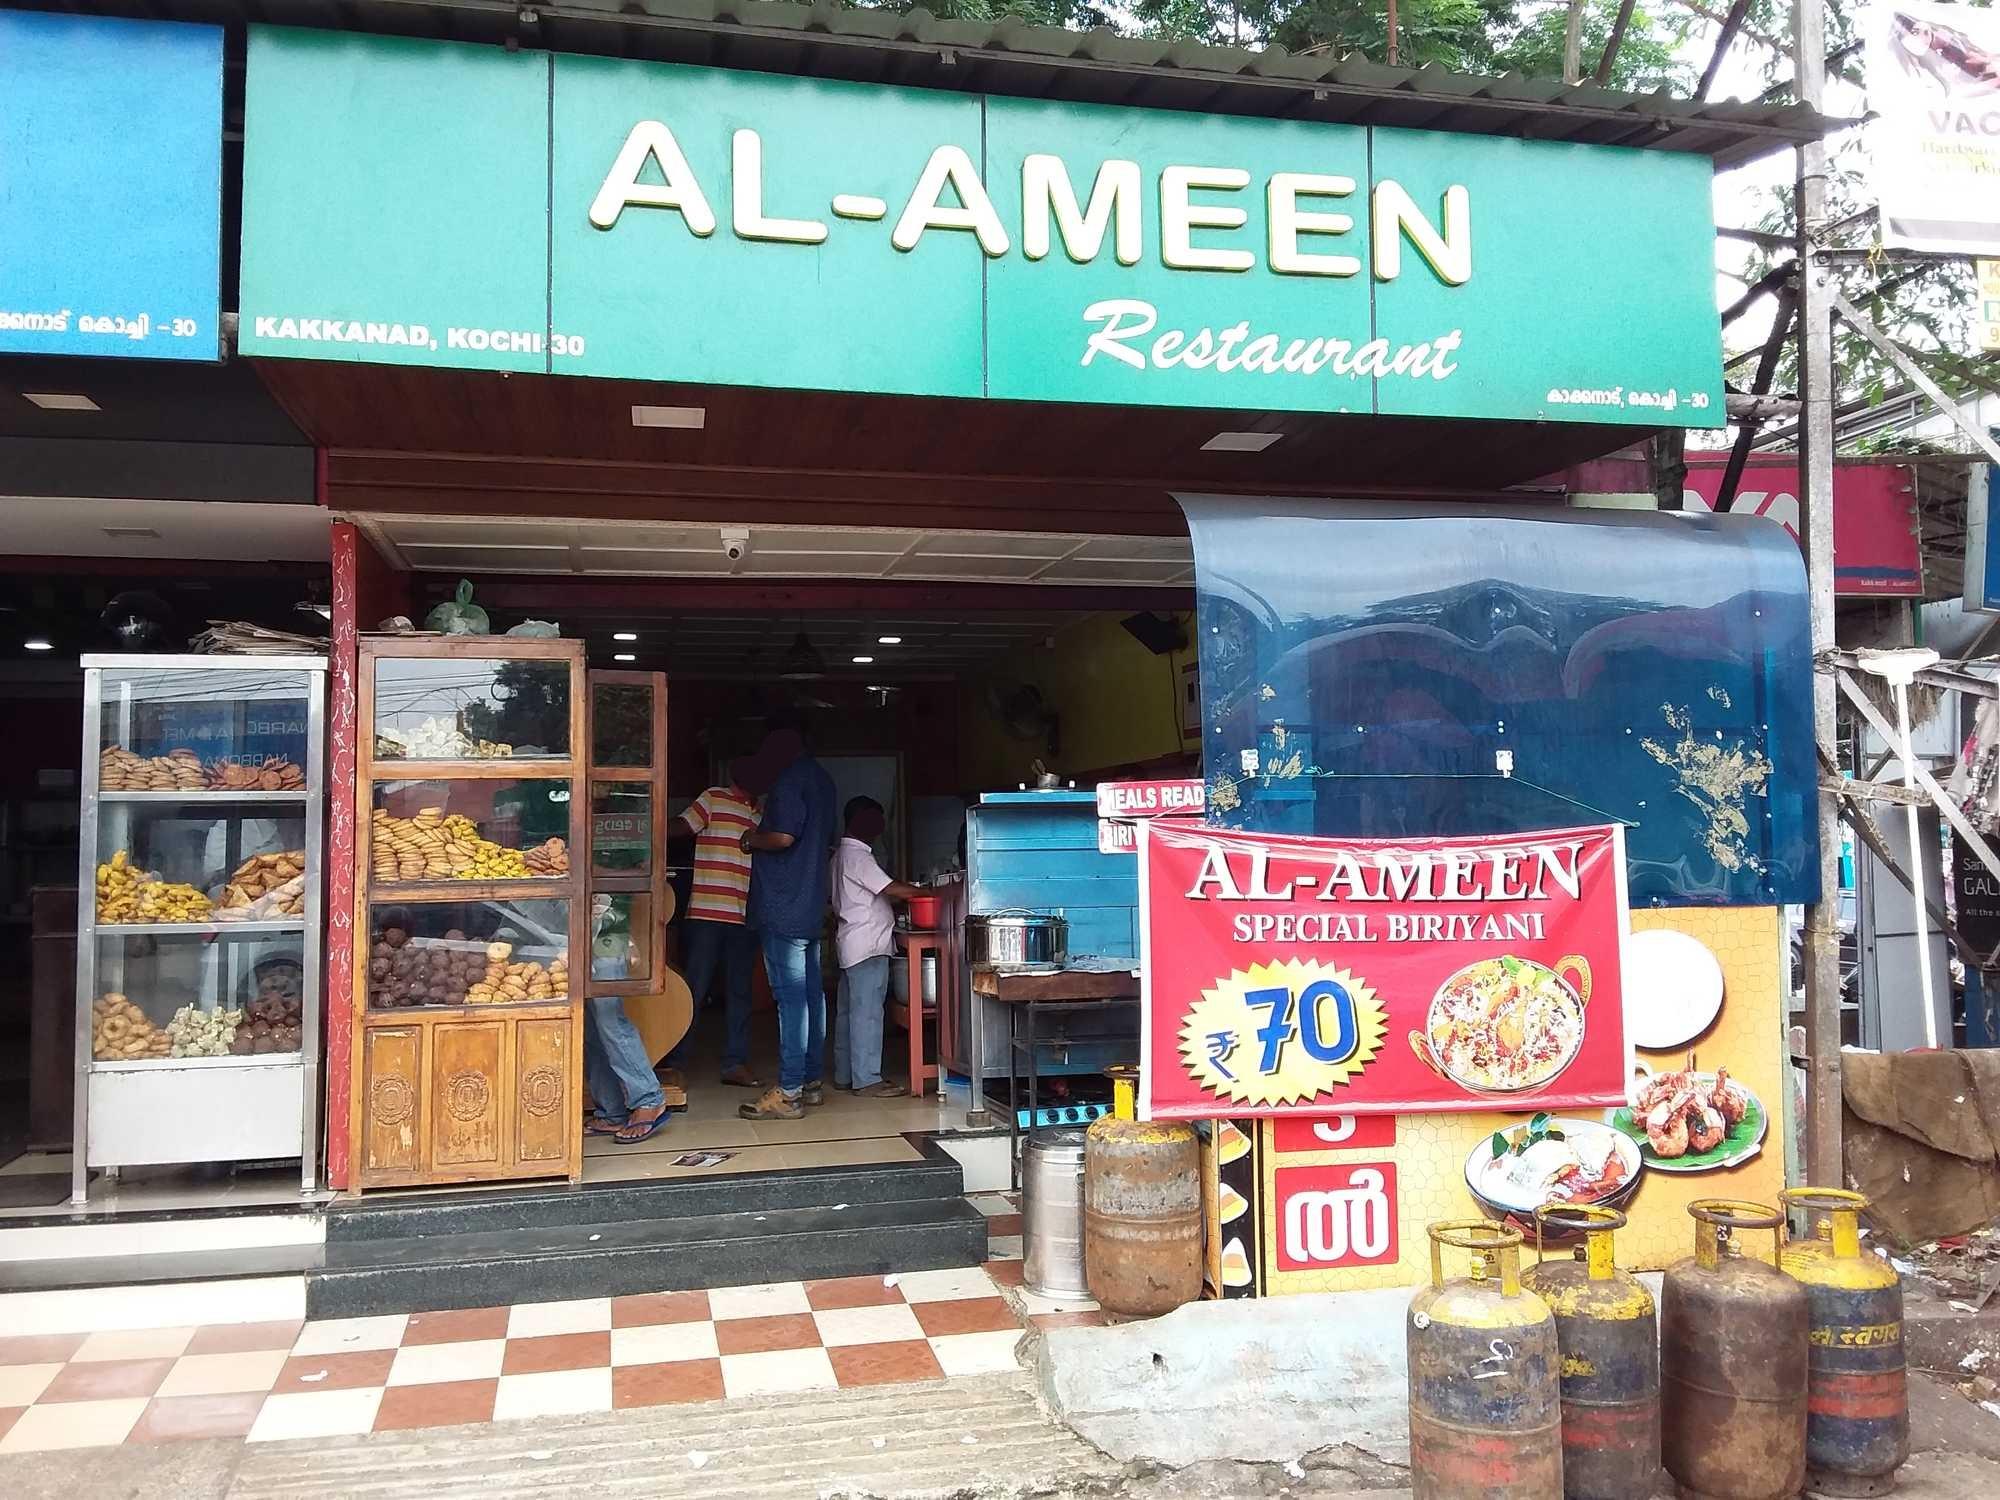 Hotel Al-Ameen - Kakkanad - Kochi Image